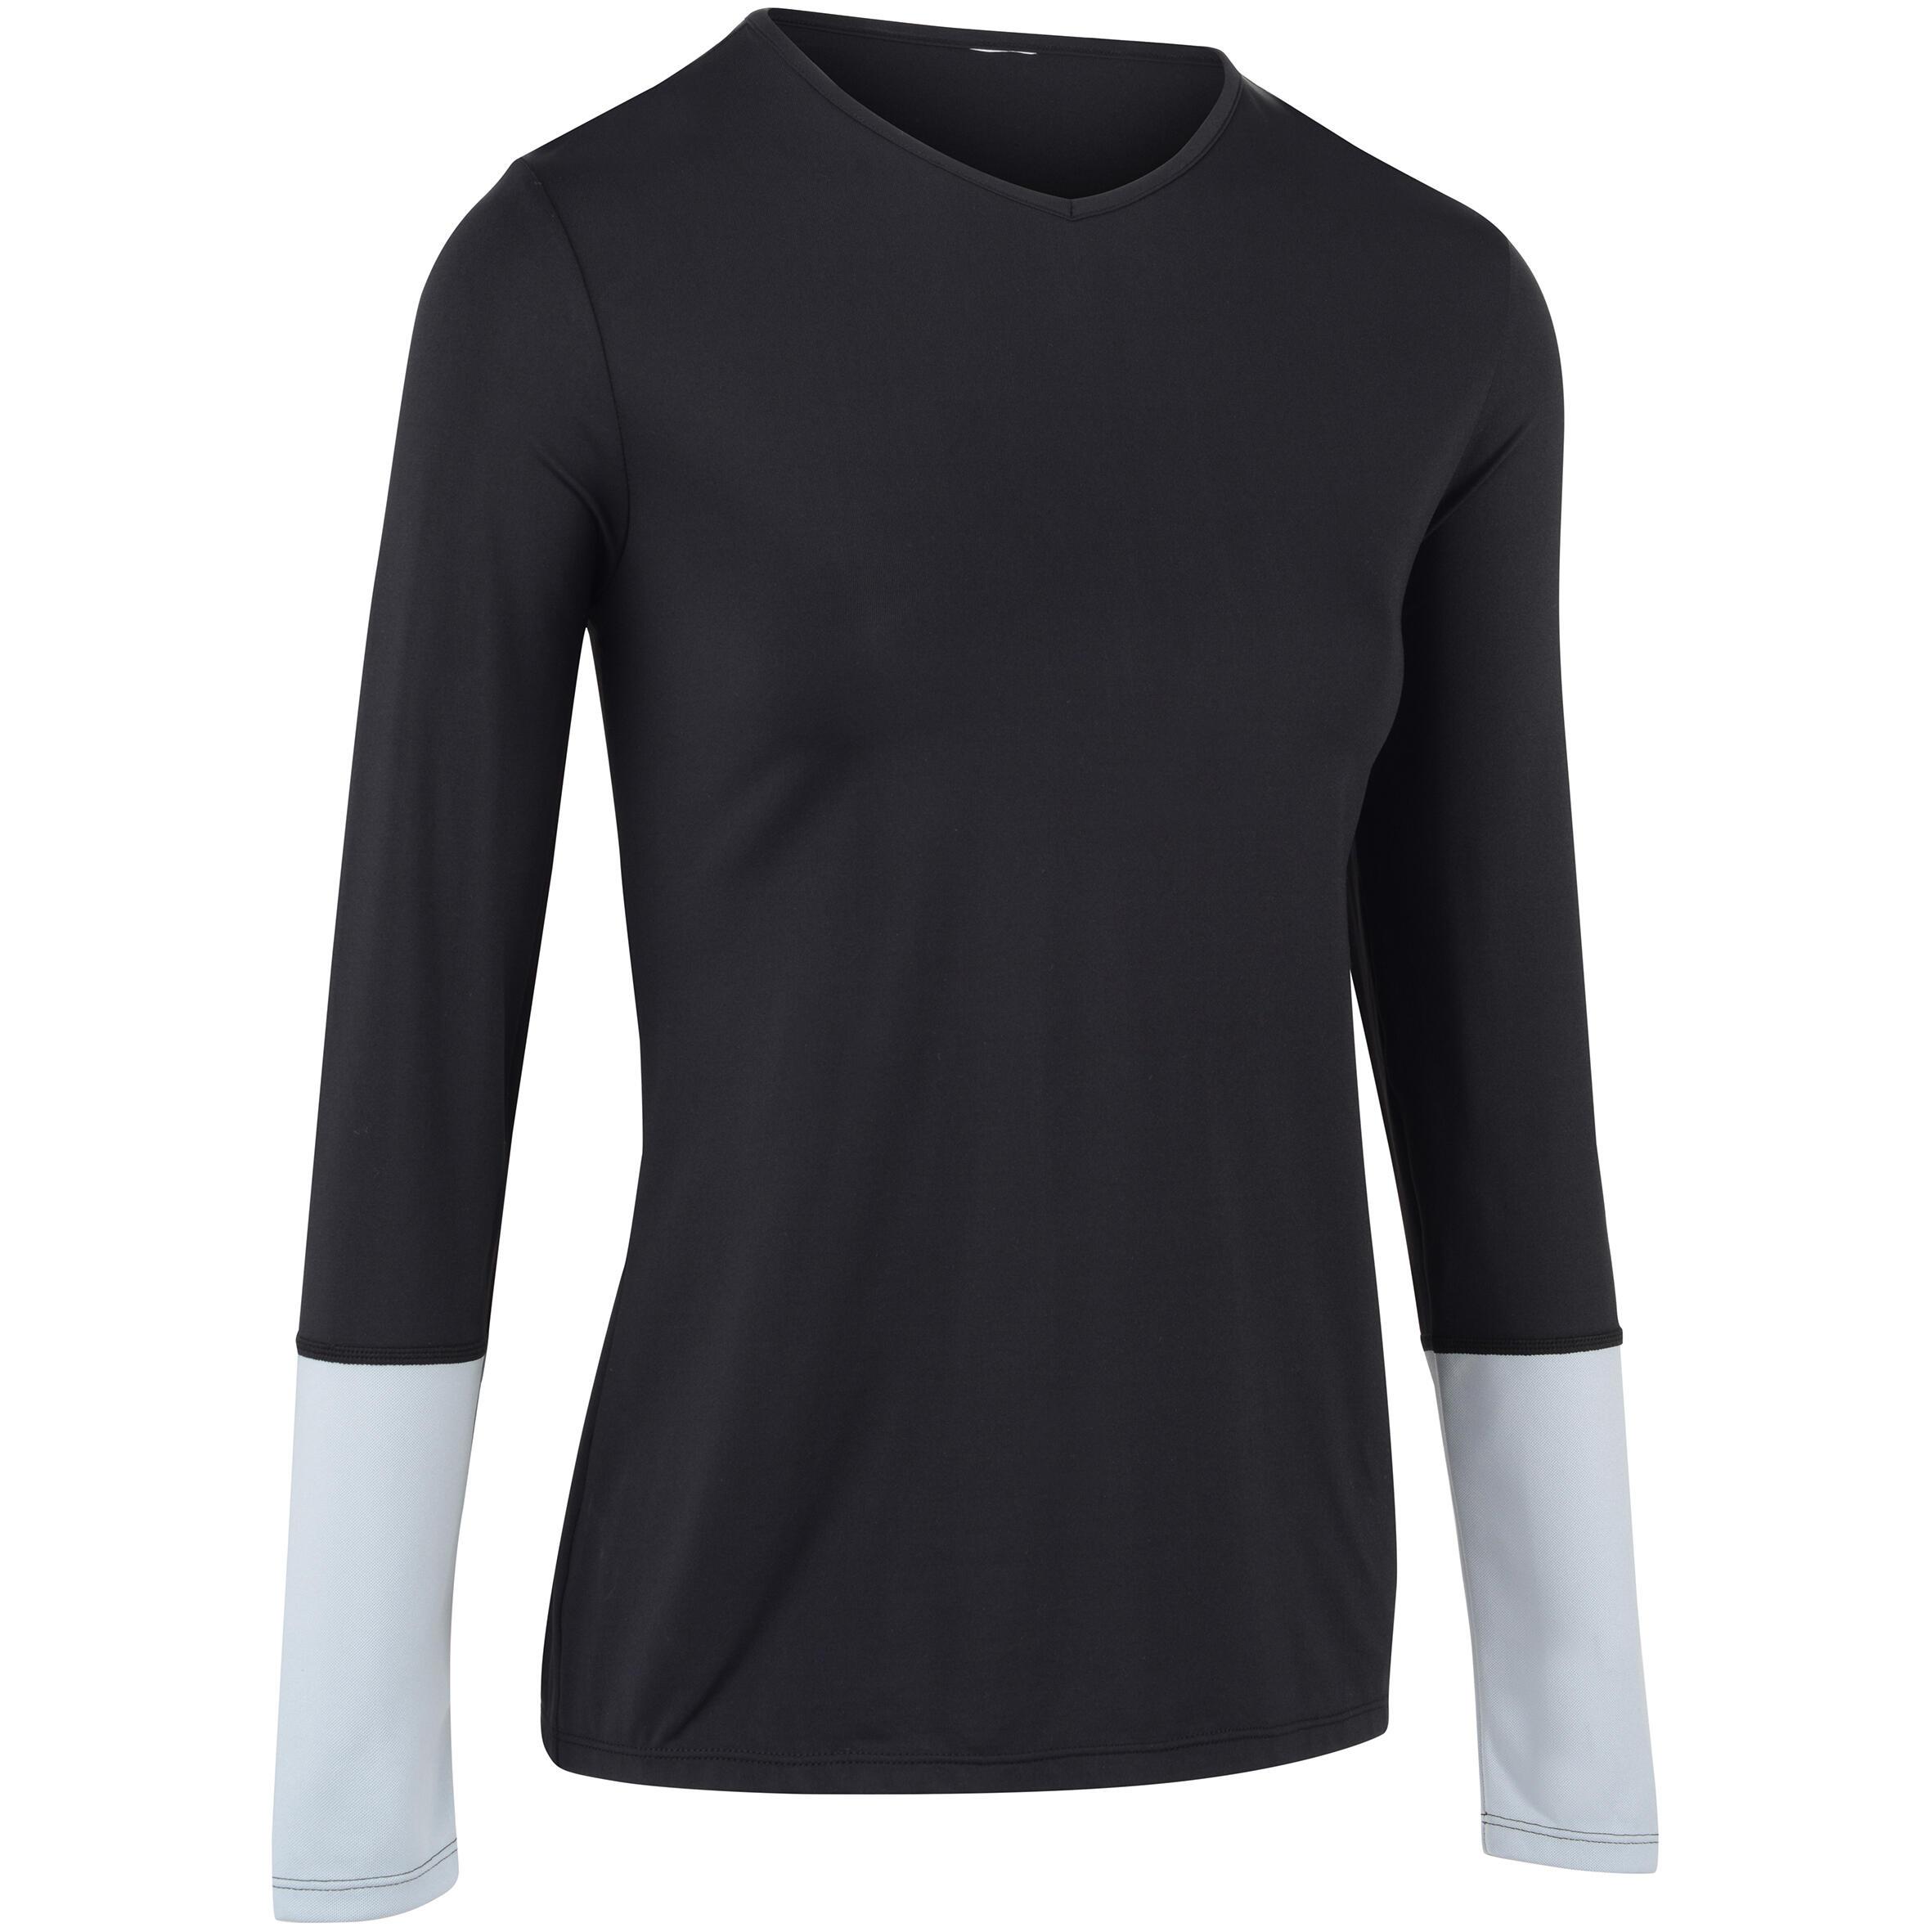 Artengo Dames T-shirt Essentiel badminton/tennis/tafeltennis/padel/squash